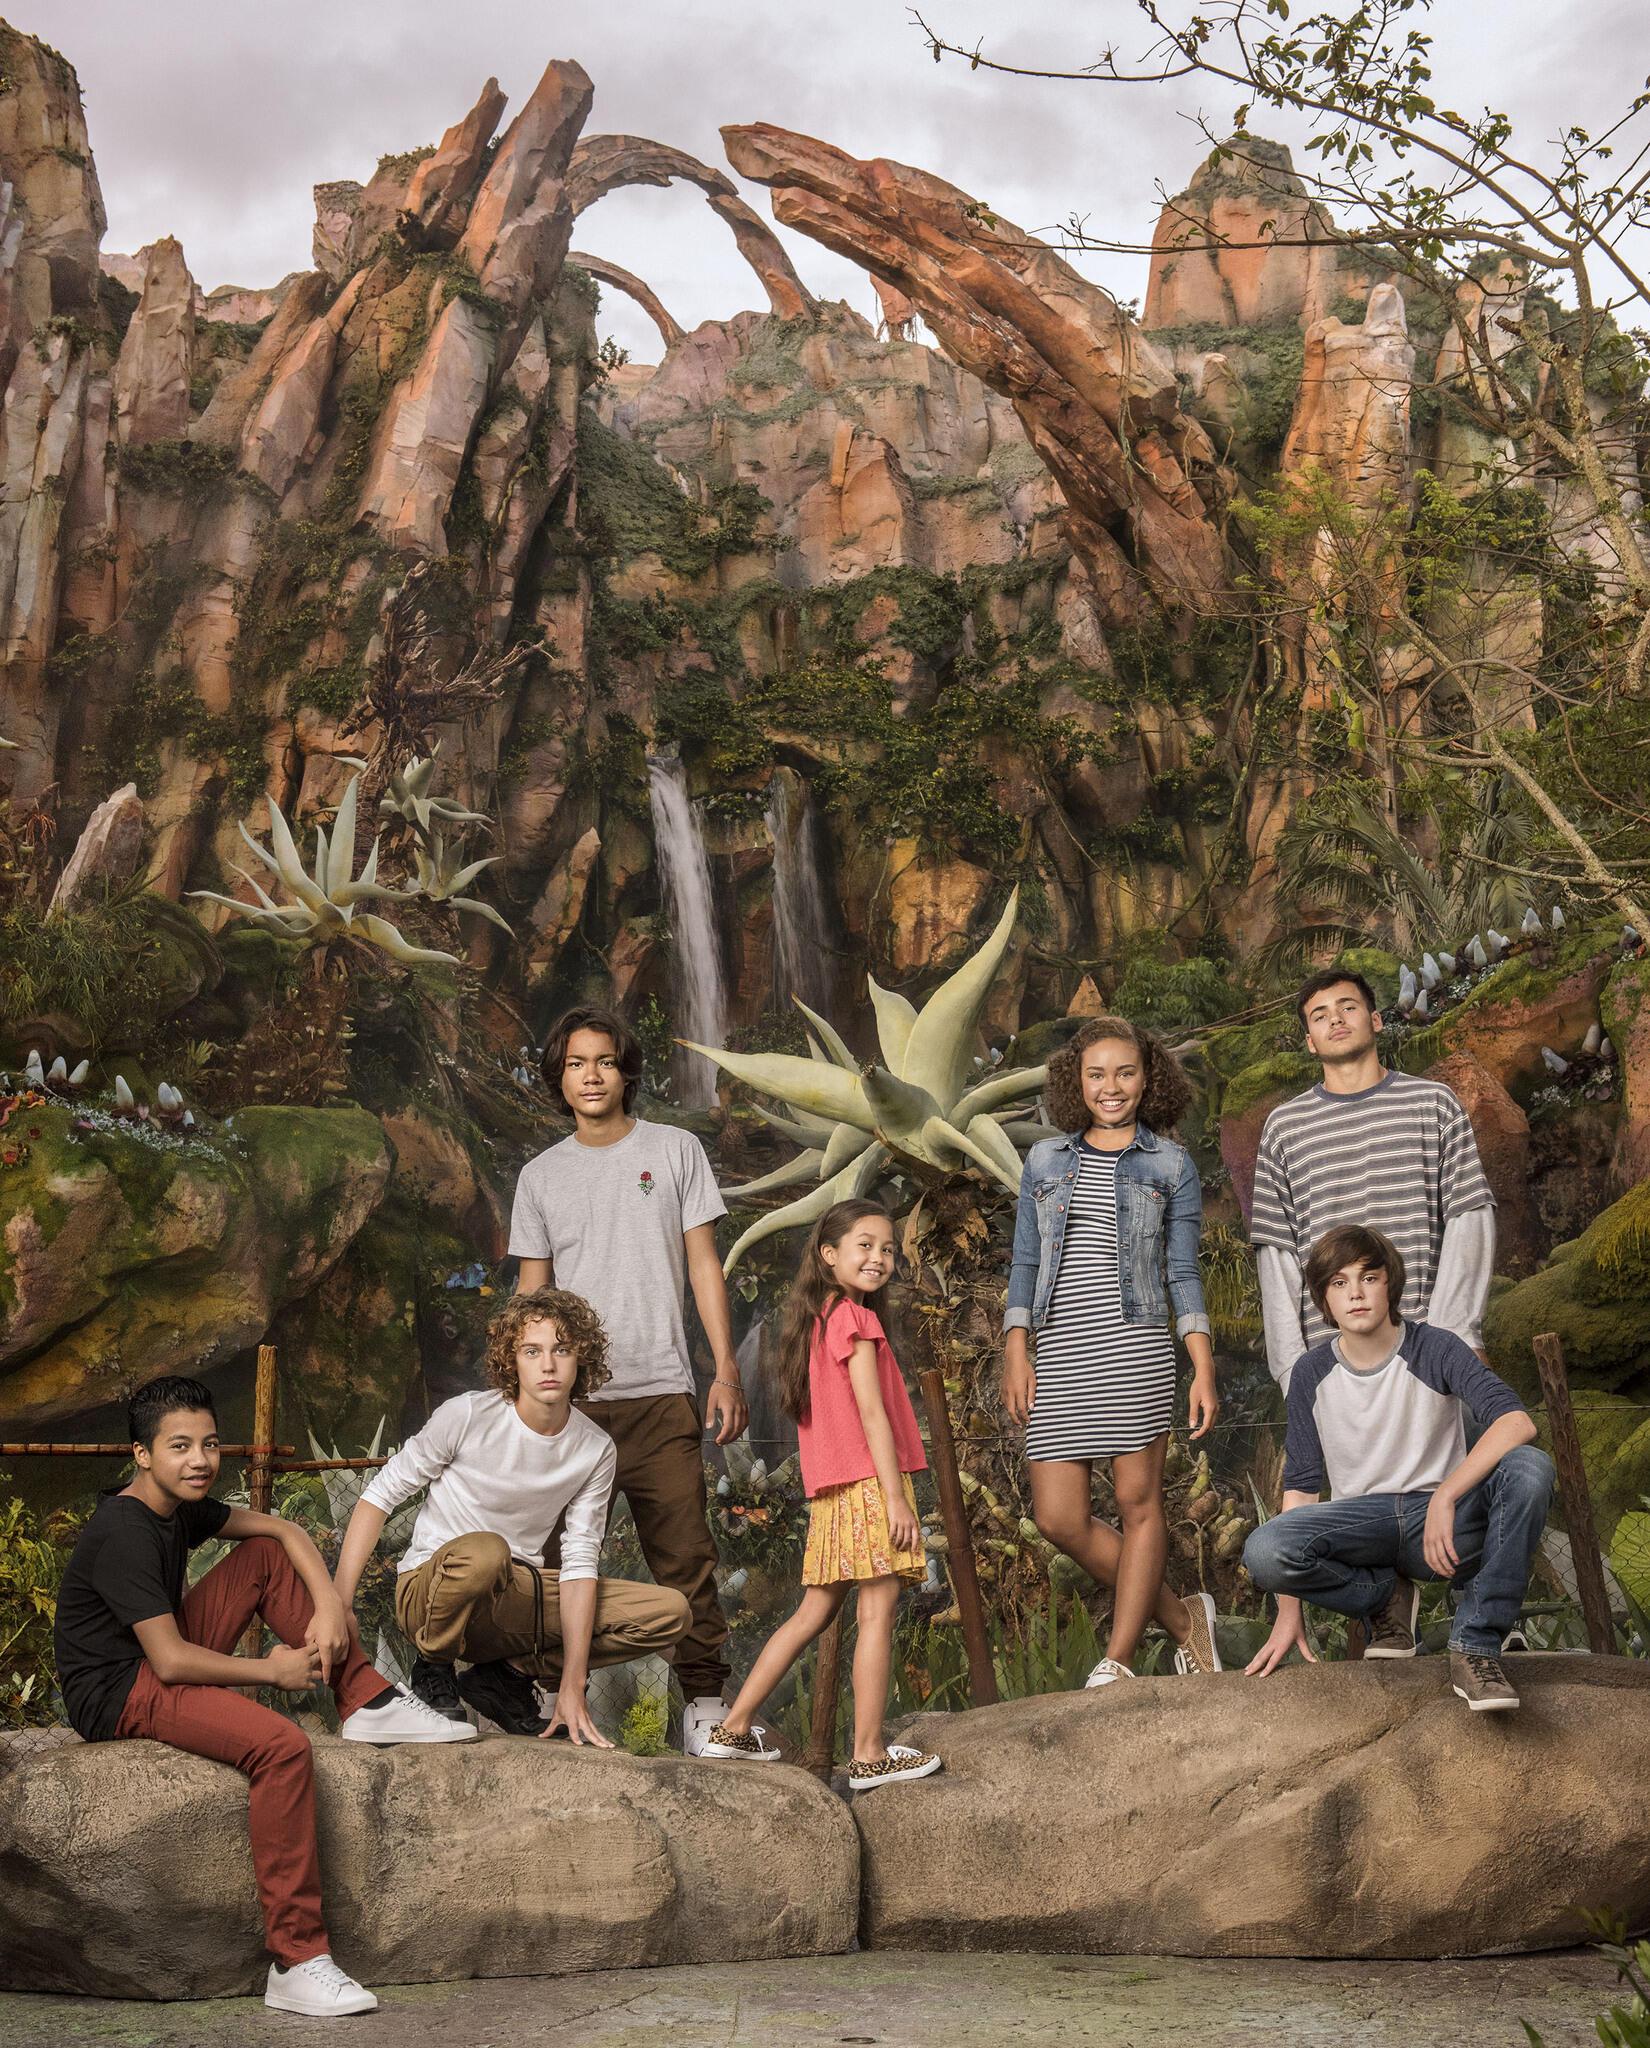 Avatar 2 2018 Movie Trailer: Britain Dalton